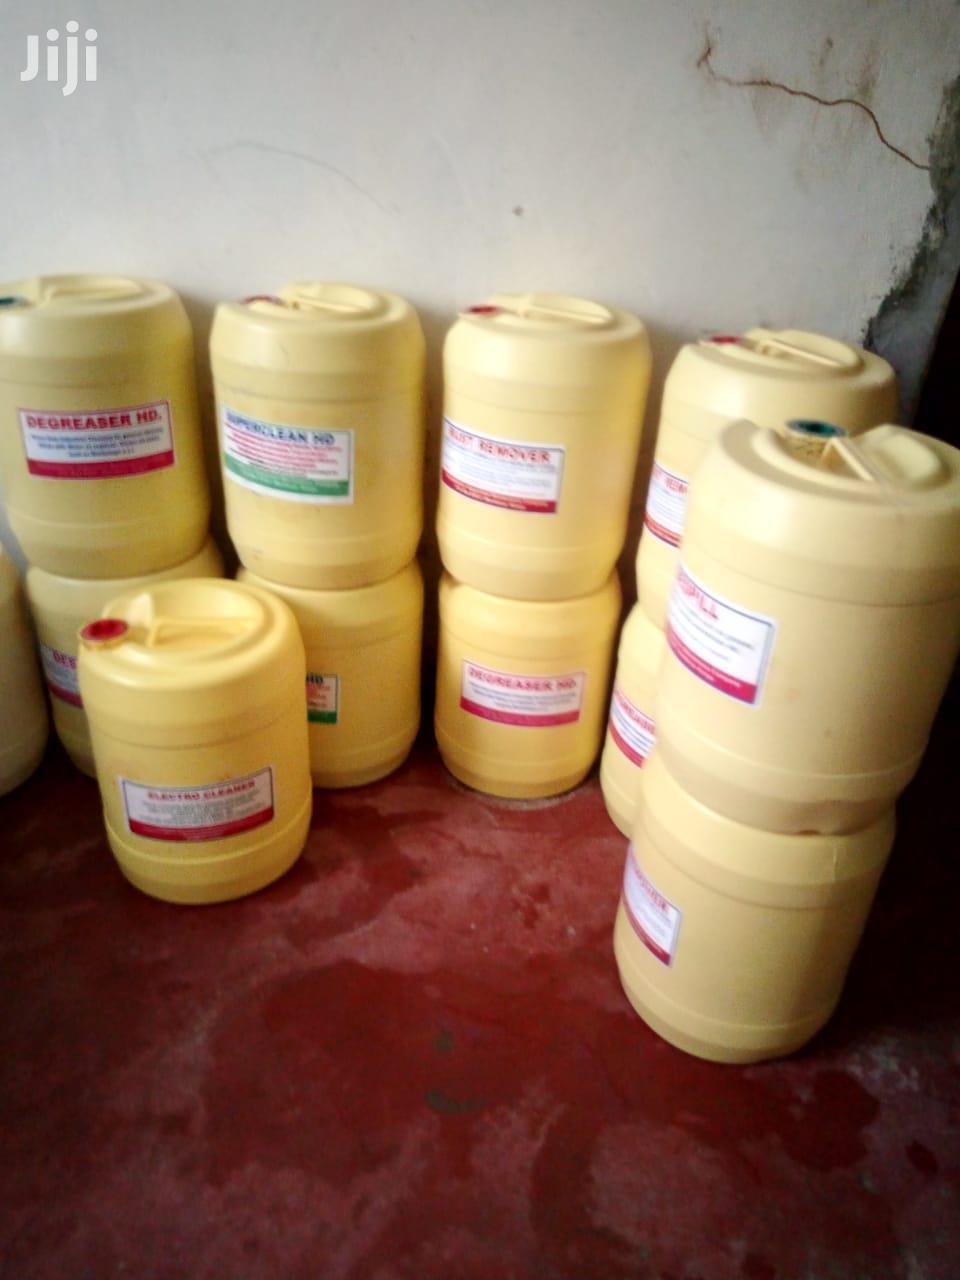 Marine Engineering Chemicals | Manufacturing Materials for sale in Changamwe, Mombasa, Kenya